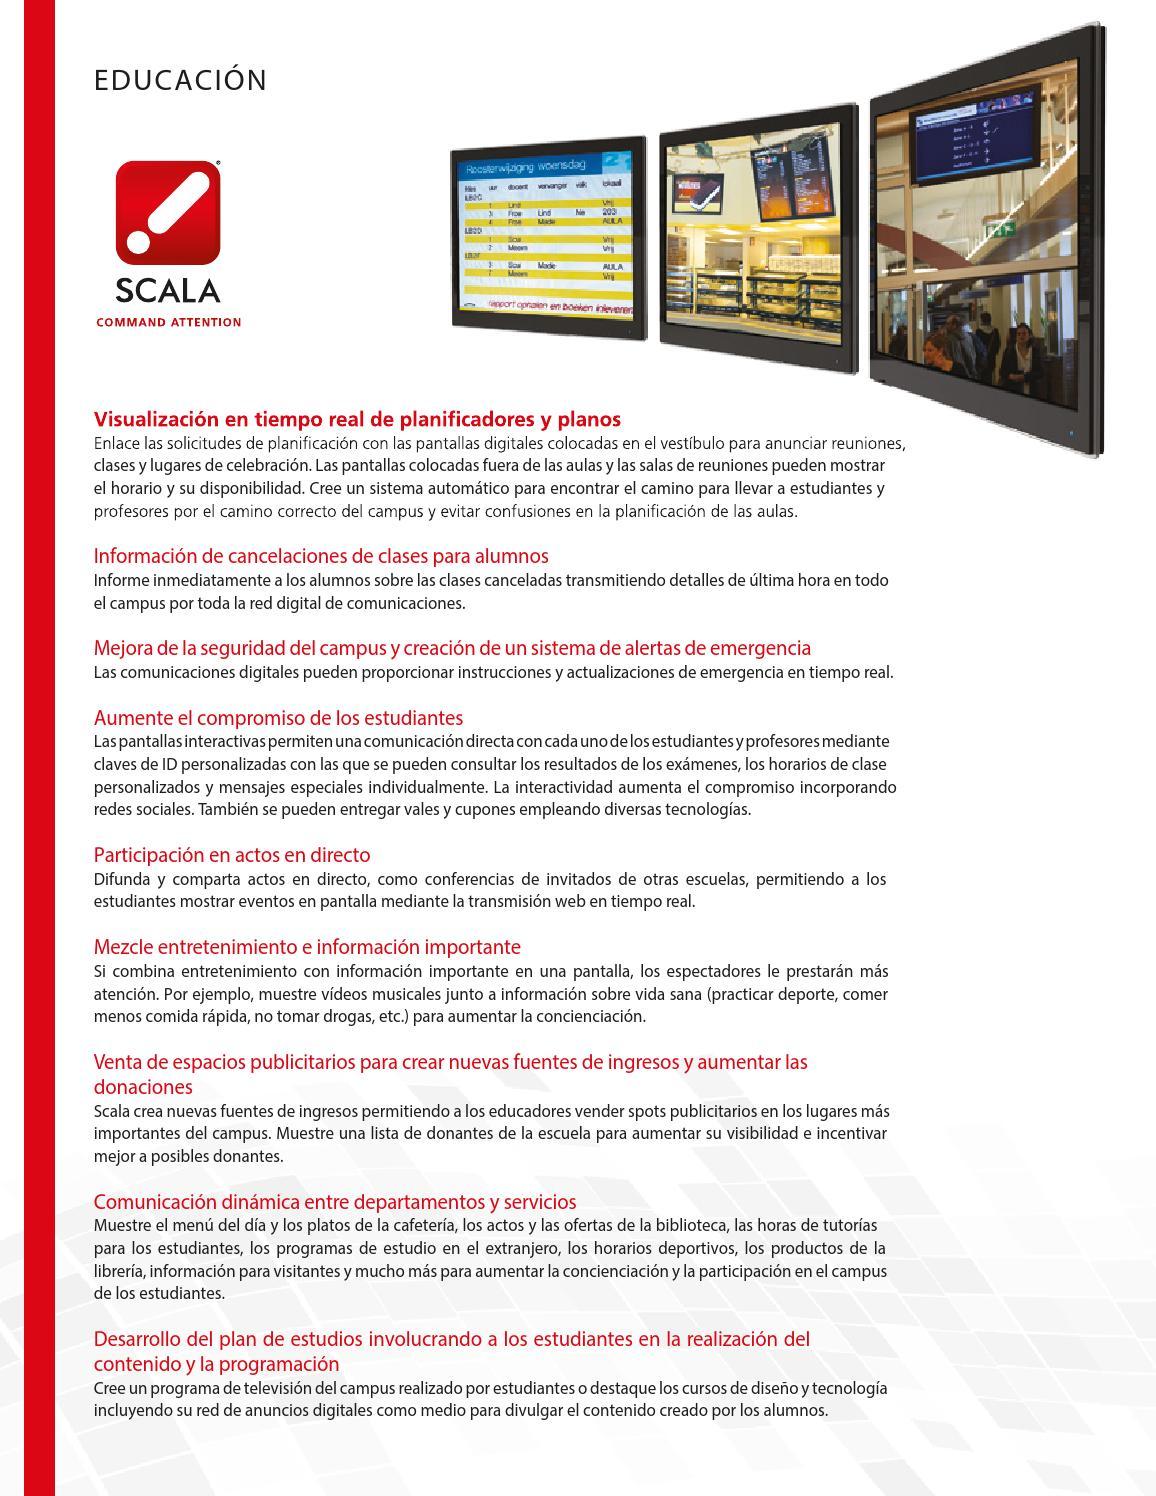 Scala digital signage educacion by Difusión Tecnológica - issuu